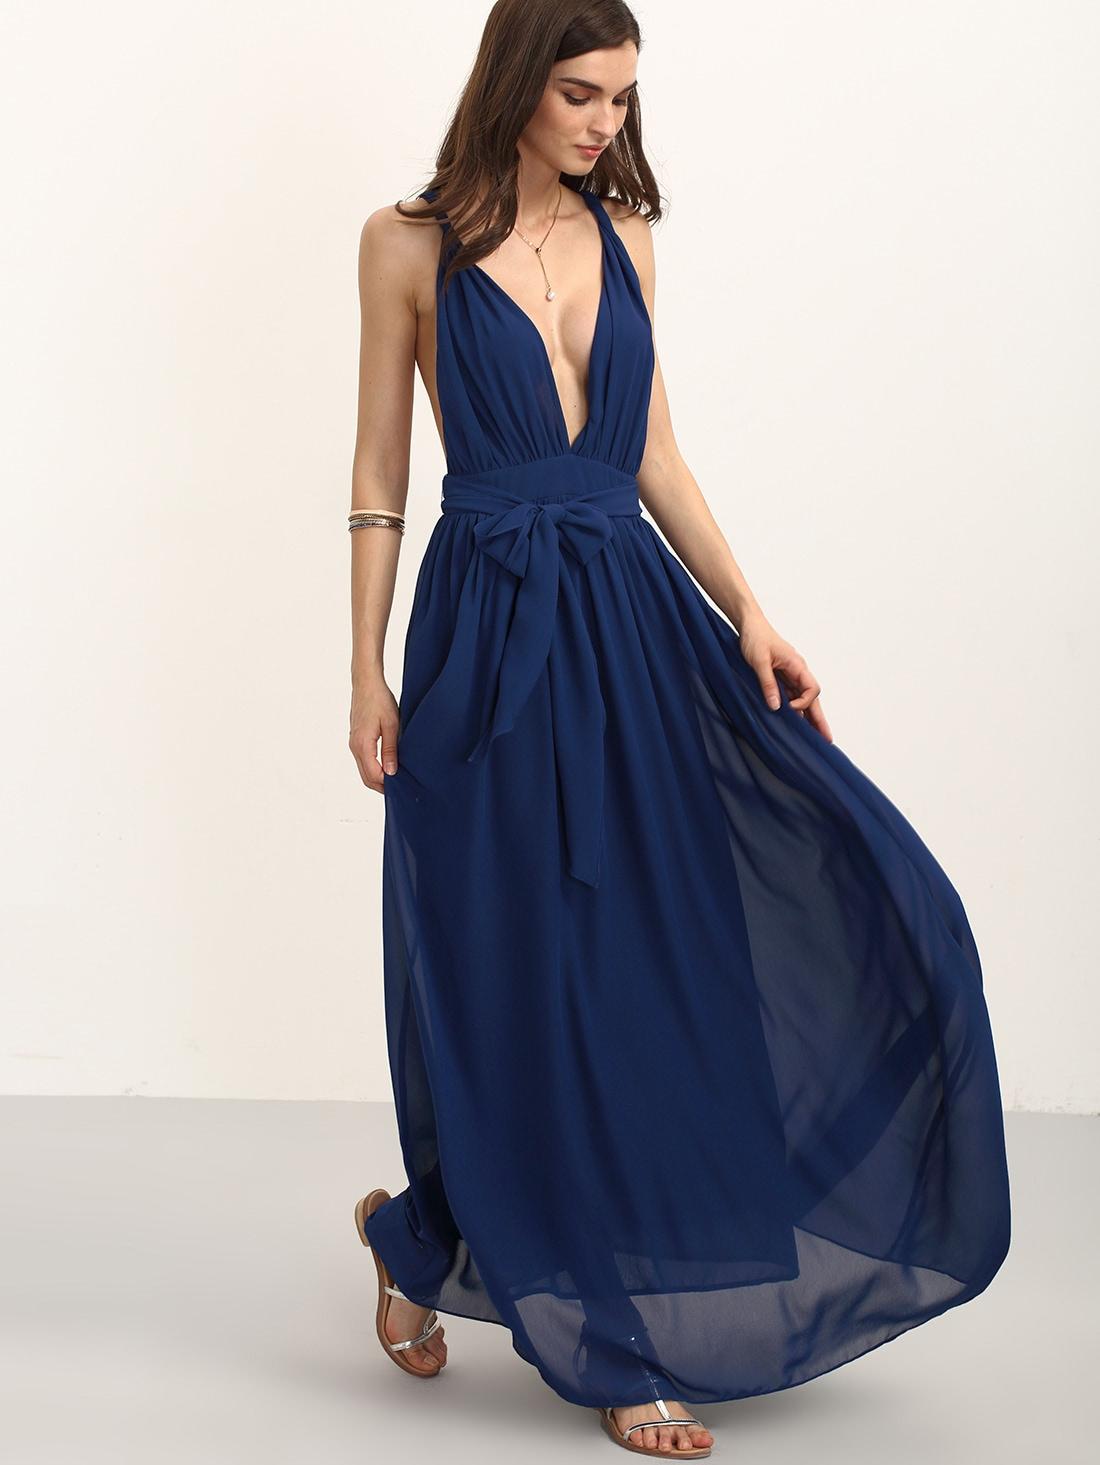 Robe longue col V sans manche avec ceinture  bleu marineFrench SheInSheinside